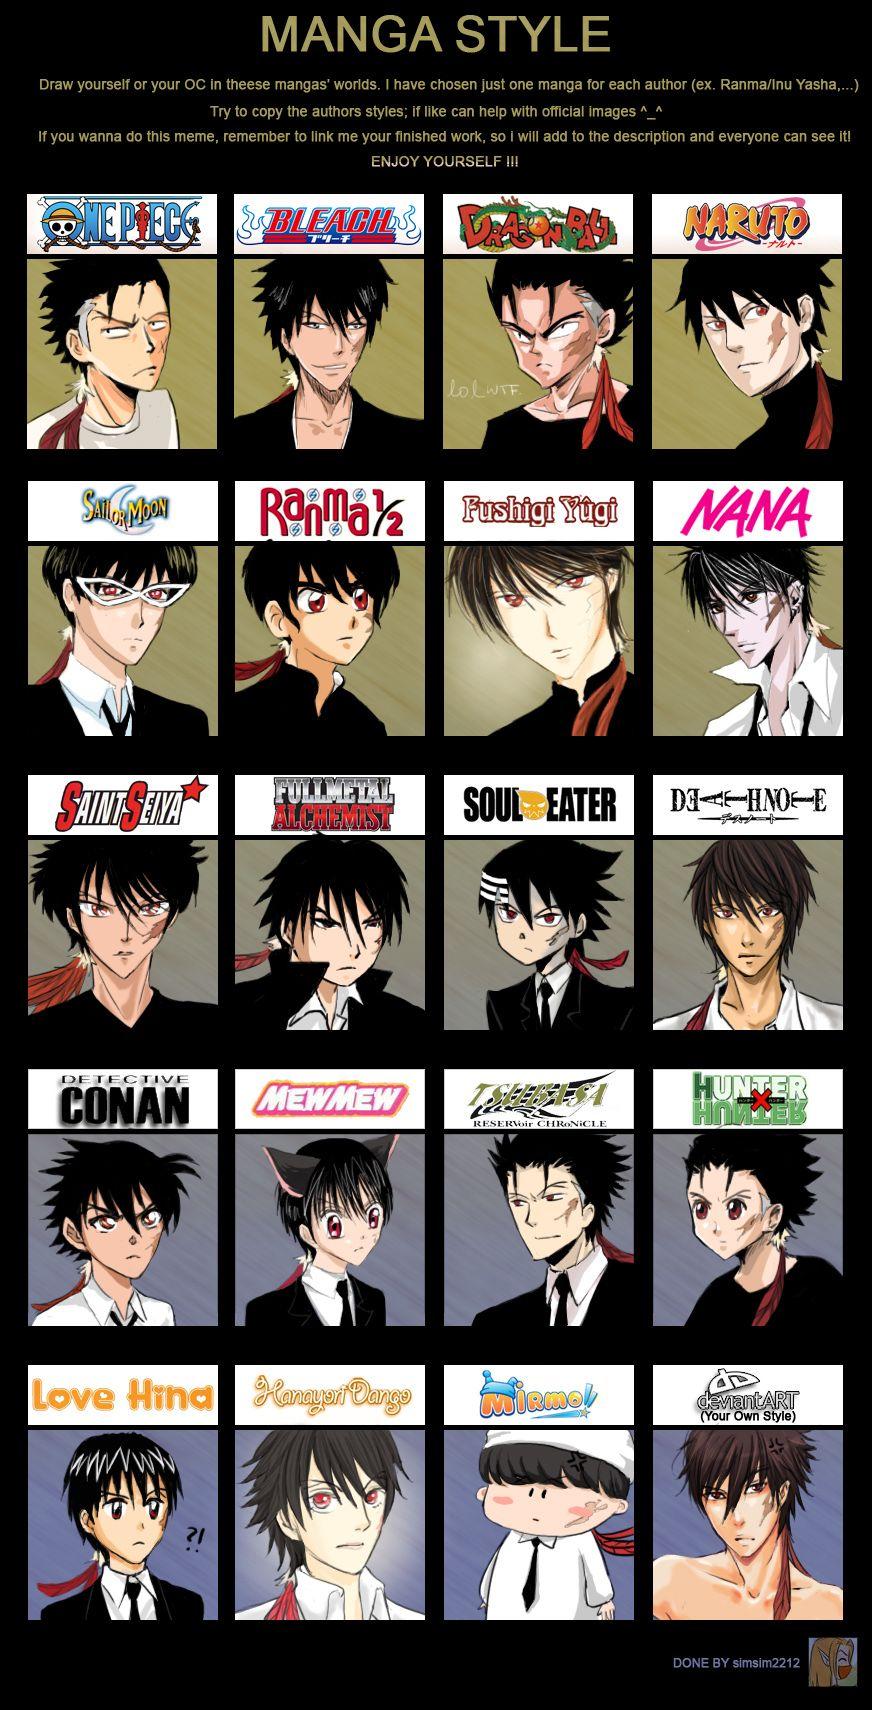 Manga Style Meme Boss Ver By Kayoru On Deviantart Anime Drawing Styles Anime Drawings Bleach Anime